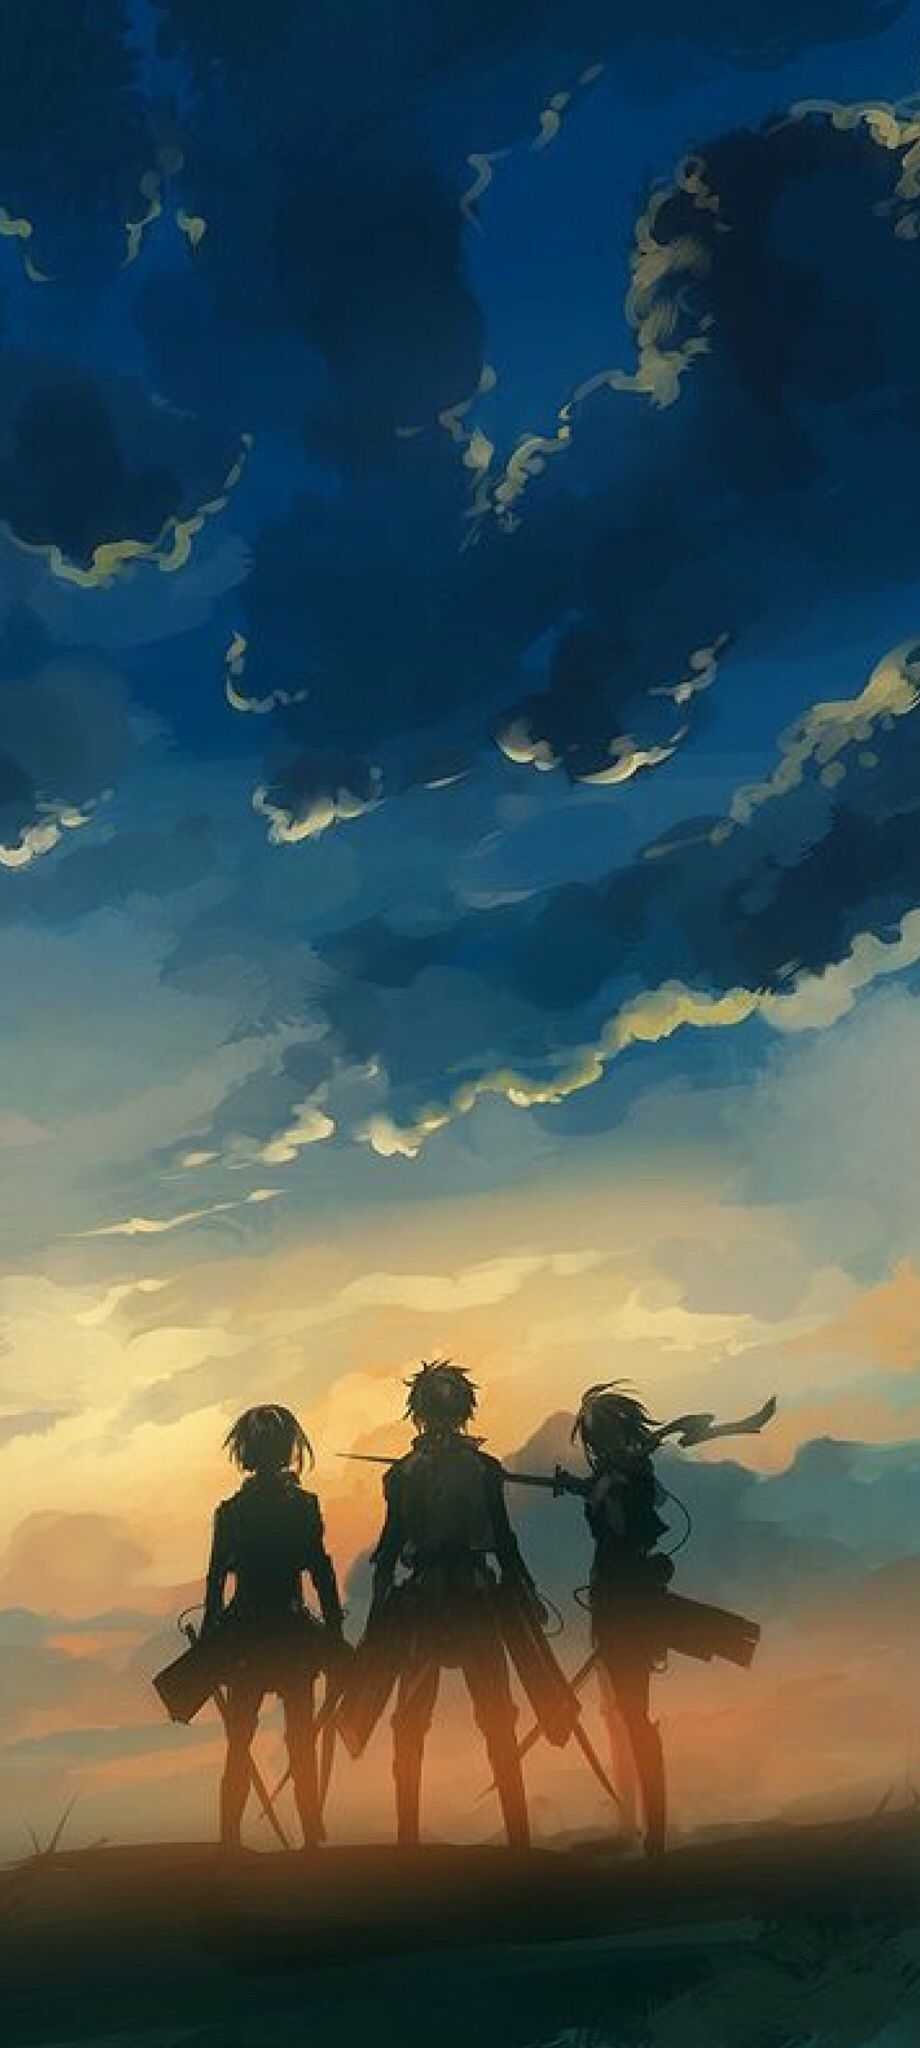 Aot Shingeki No Kyojin Ataque Dos Titas Attack On Titan